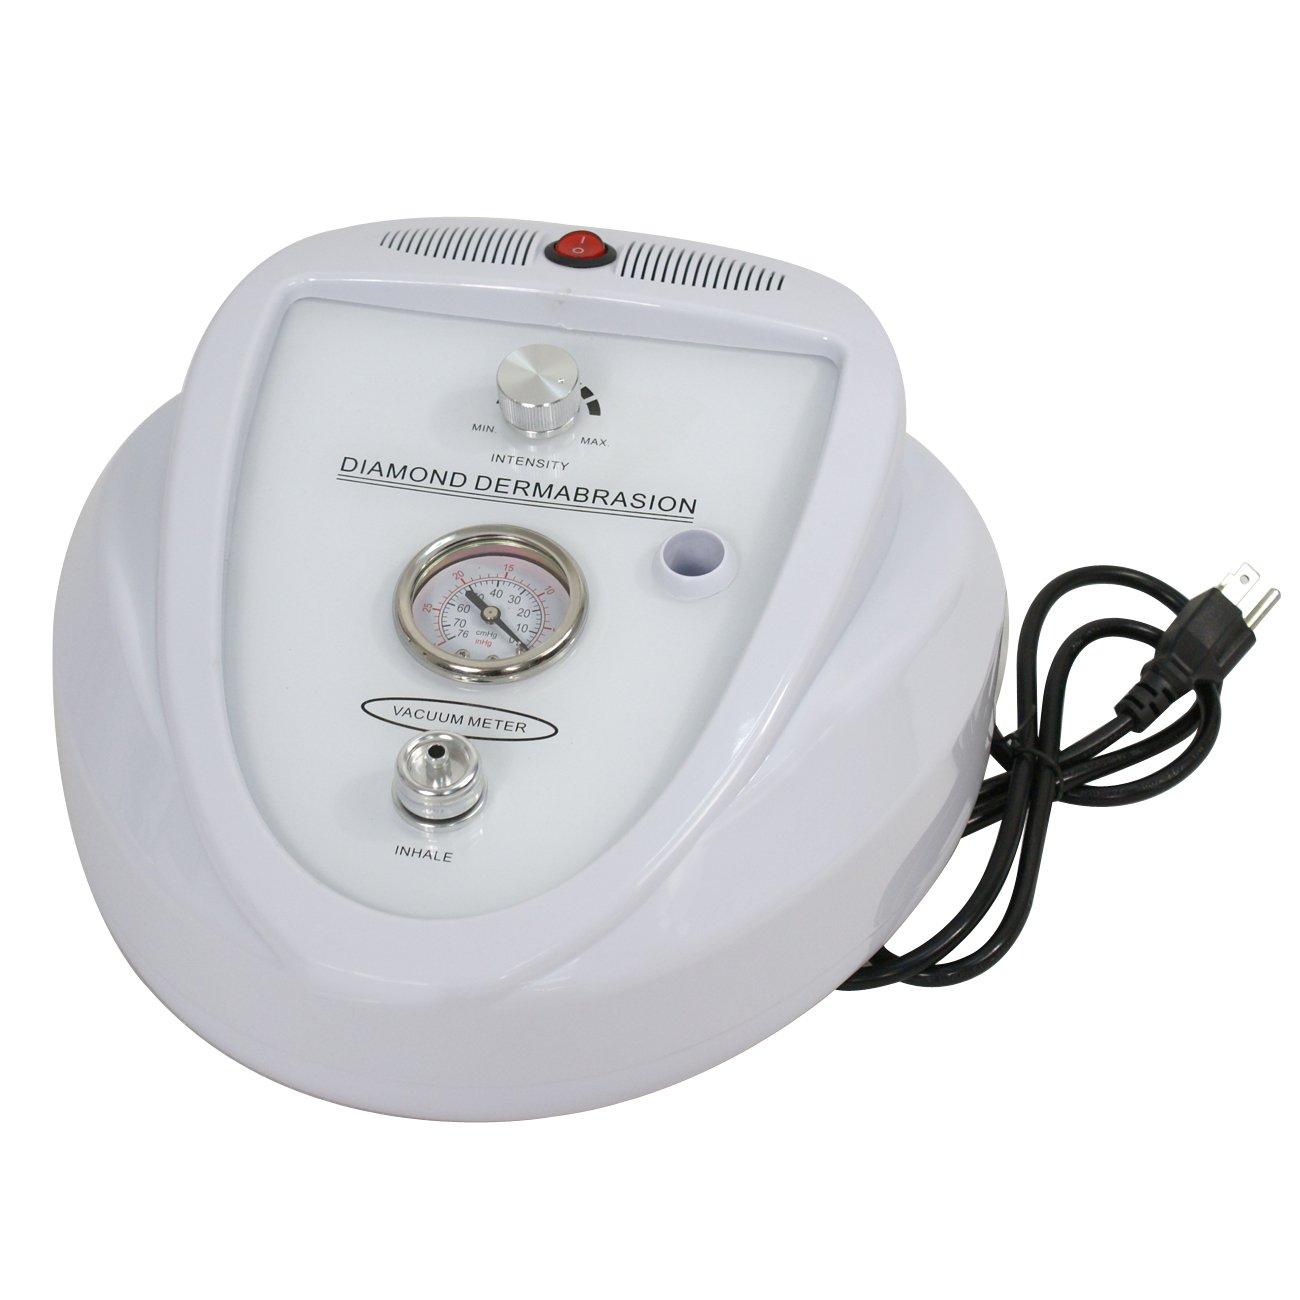 ZENY Pro Diamond Dermabrasion Microdermabrasion Safe Skin Peel Personal Home Use Beauty Machine (Suction power: 0-65cmHg)) by ZENY